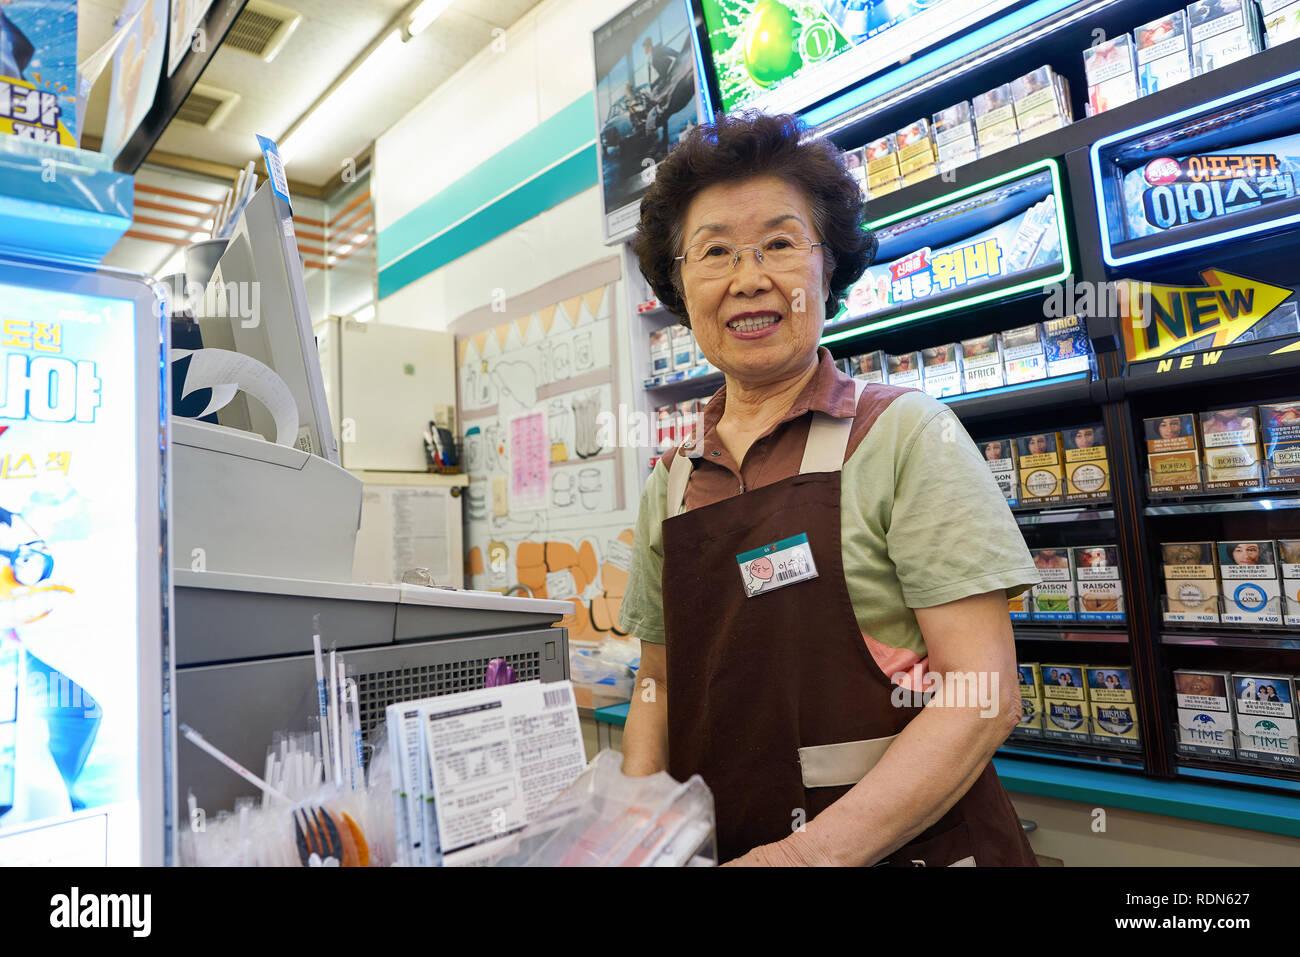 SEOUL, SOUTH KOREA - CIRCA MAY, 2017: inside GS25 convenience store in Seoul. GS25 is a convenience store brand in South Korea. Stock Photo